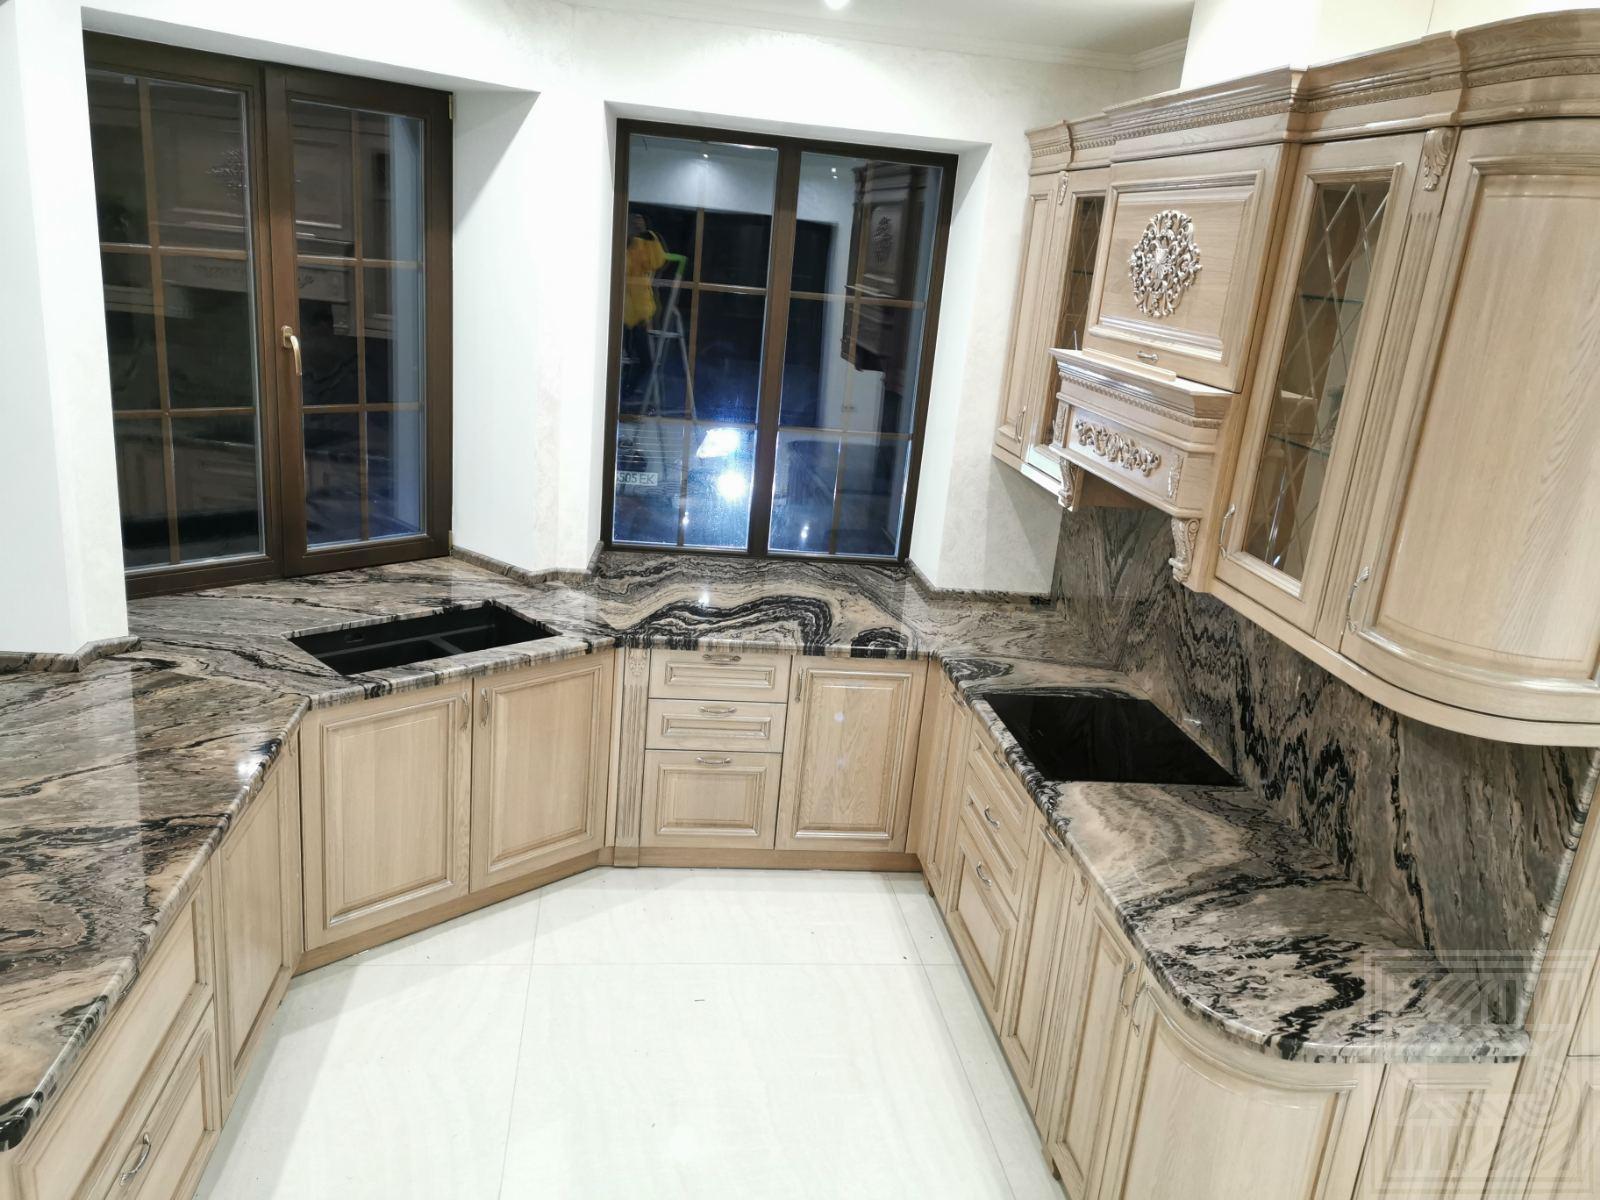 Кухонная столешница и фартук из мрамора Mercury Brown 20 mm worktop-marble - IMG 7f4b0e8bfa4ed5c0b7d70e88220cf2a6 V